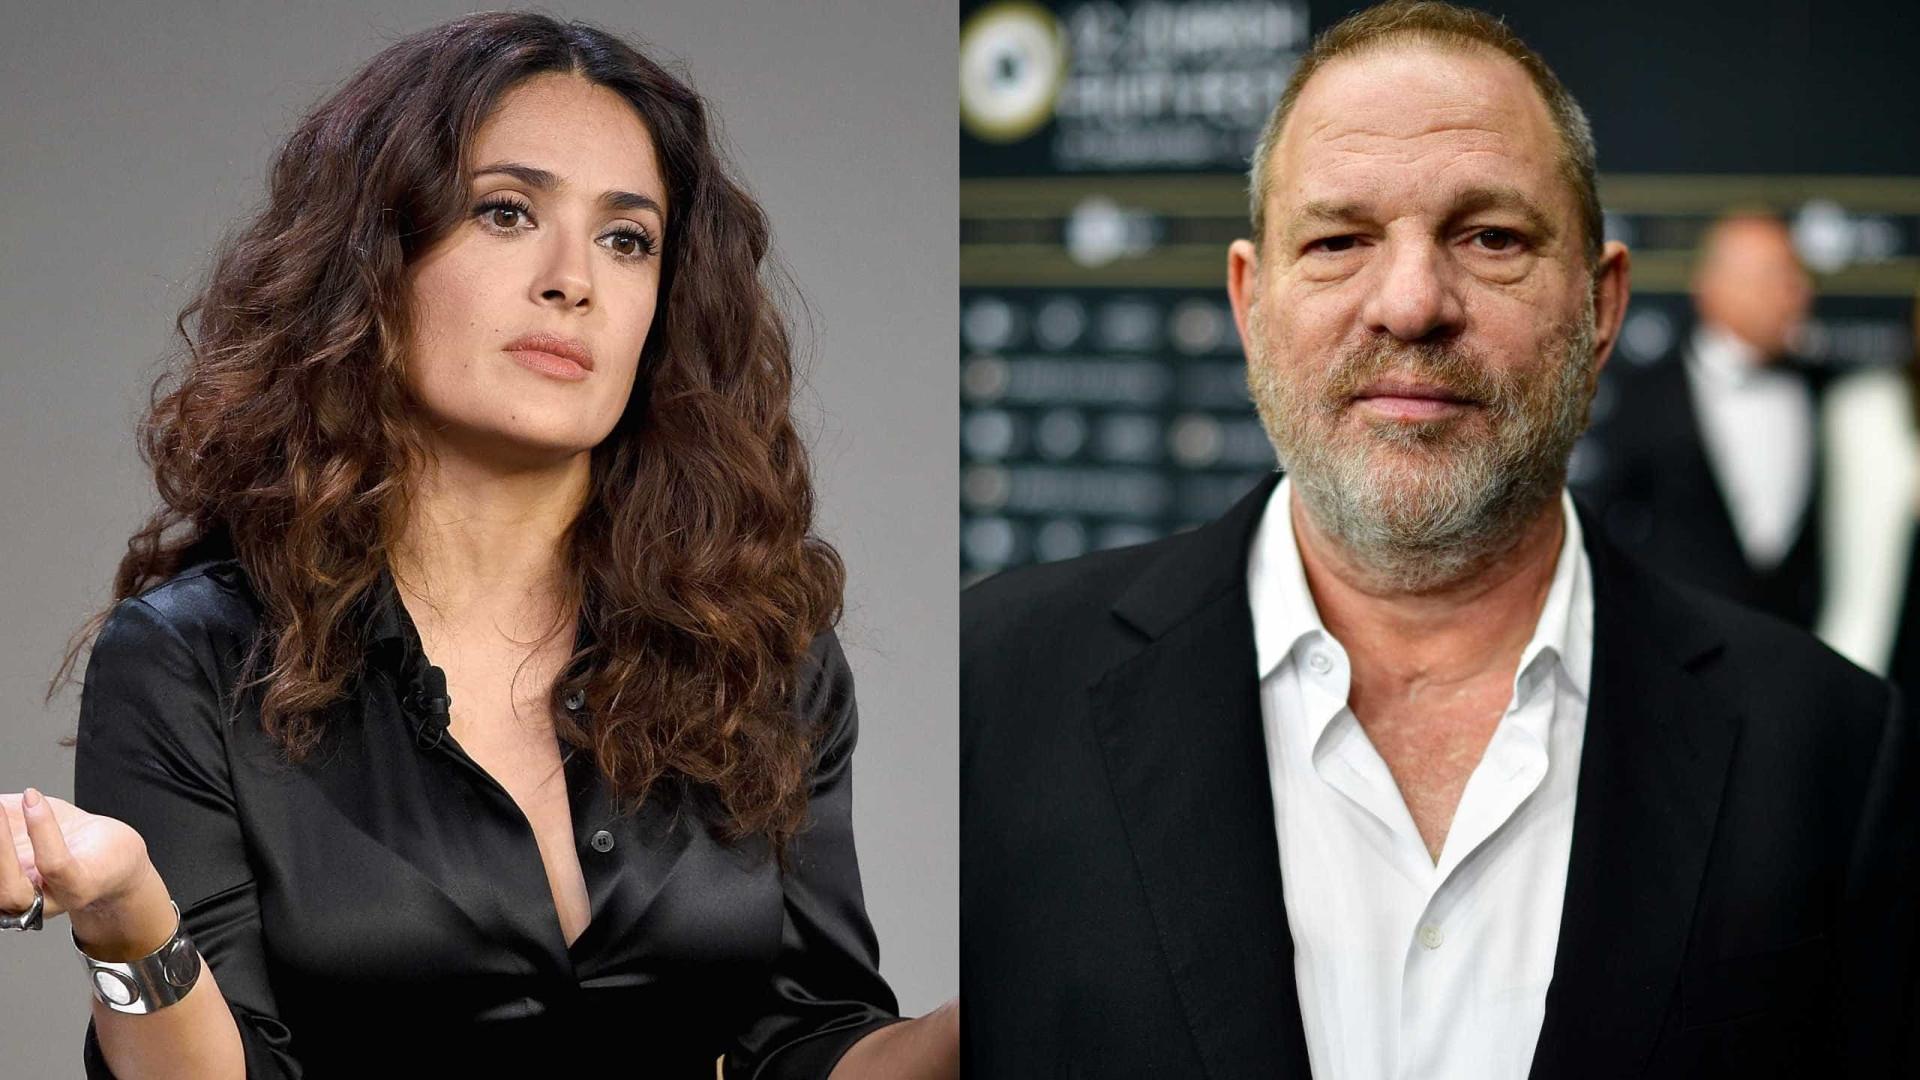 Atriz Salma Hayek denuncia assédio do produtor Harvey Weistein